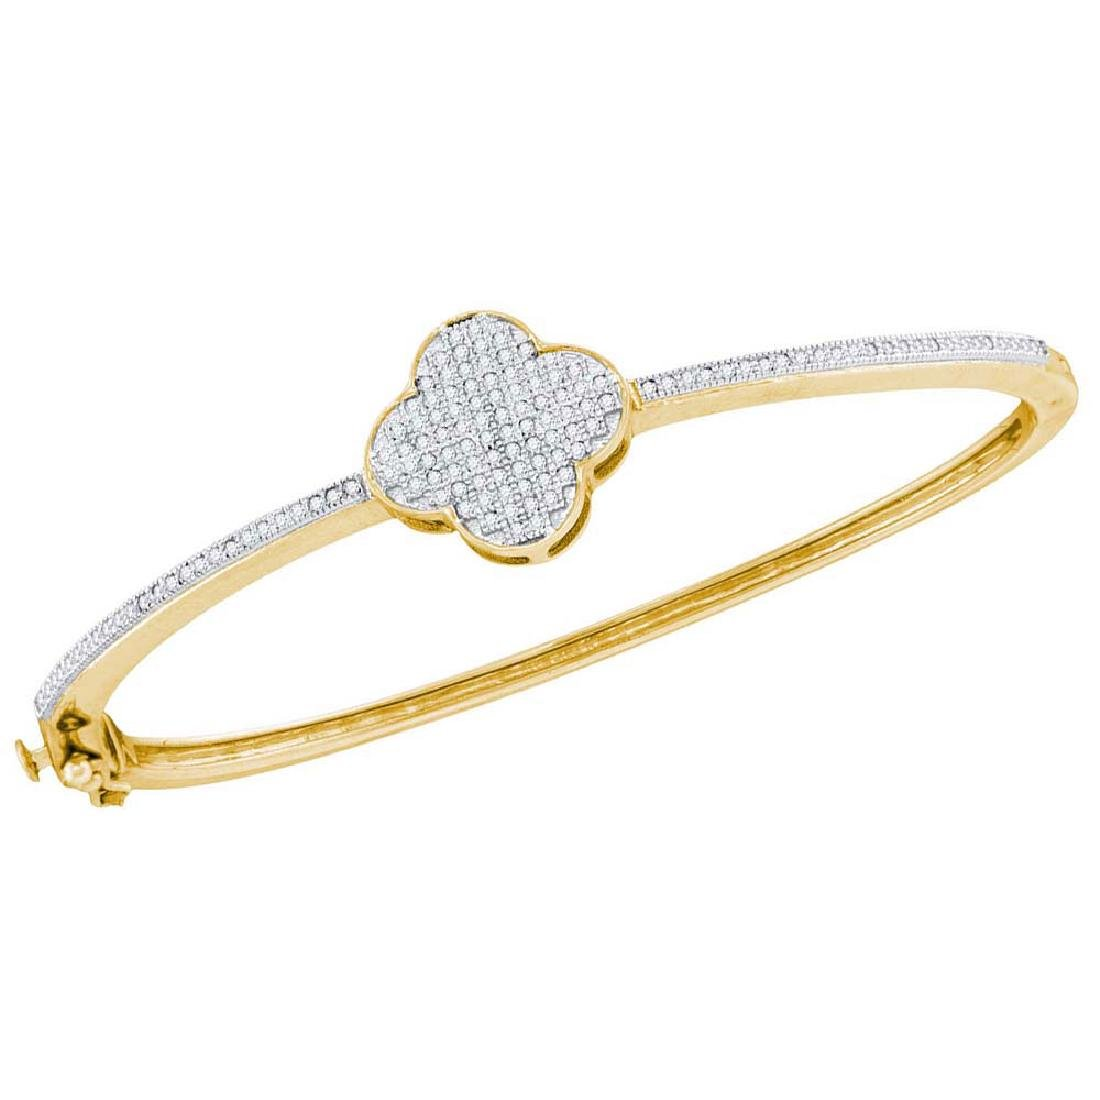 0.40 CTW Diamond Cluster Bangle Bracelet 10KT Yellow